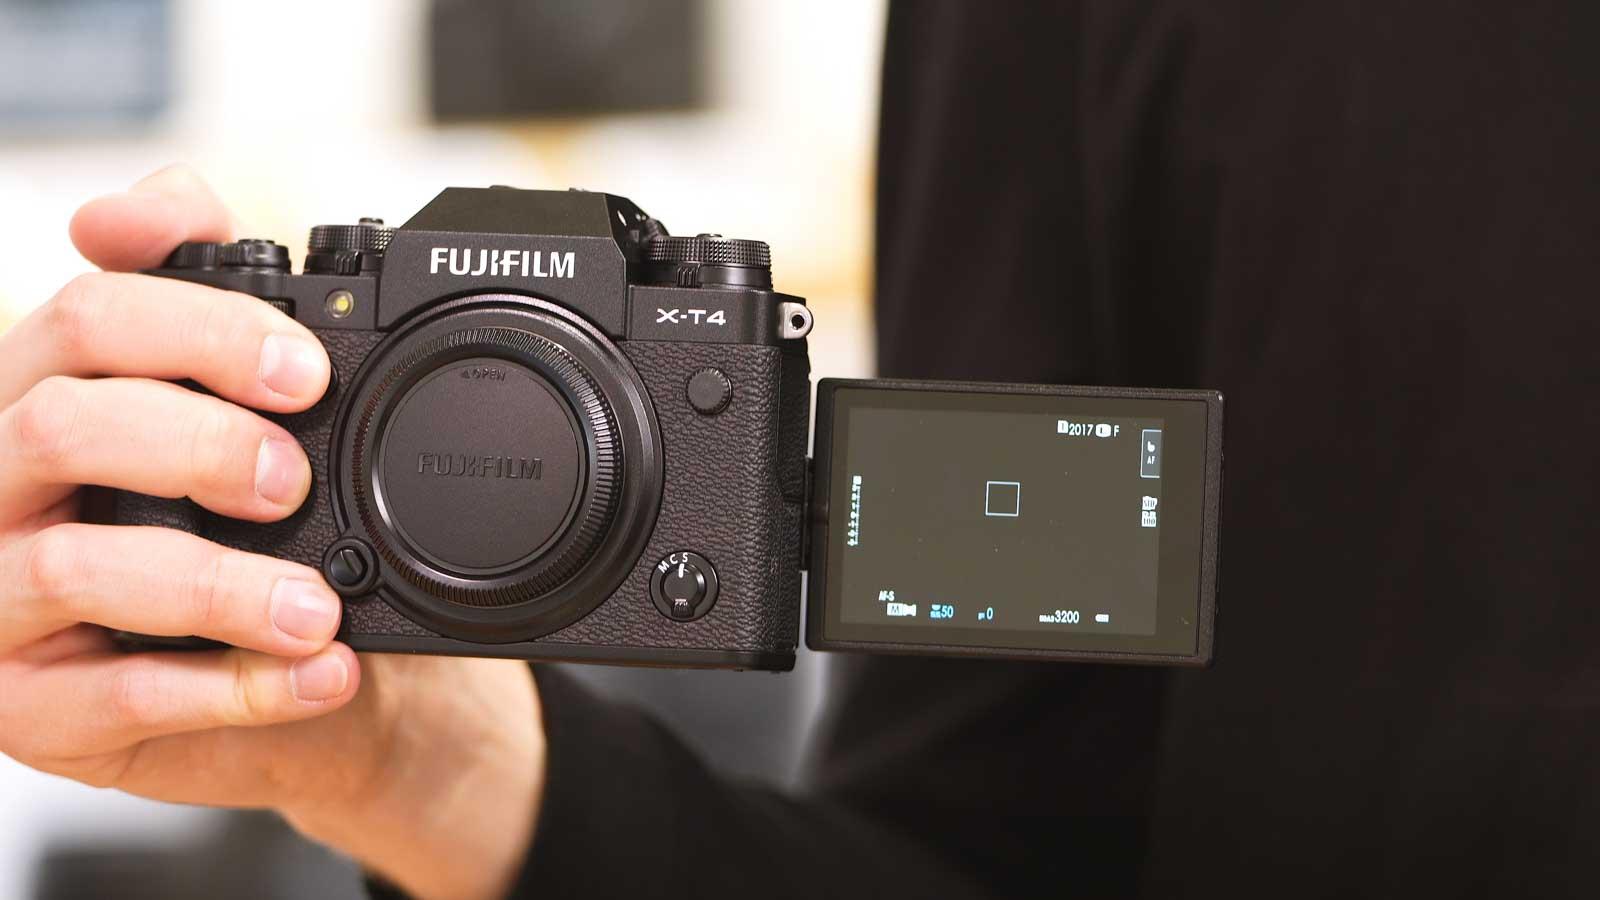 Fujifilm X-T4 Hand und Display